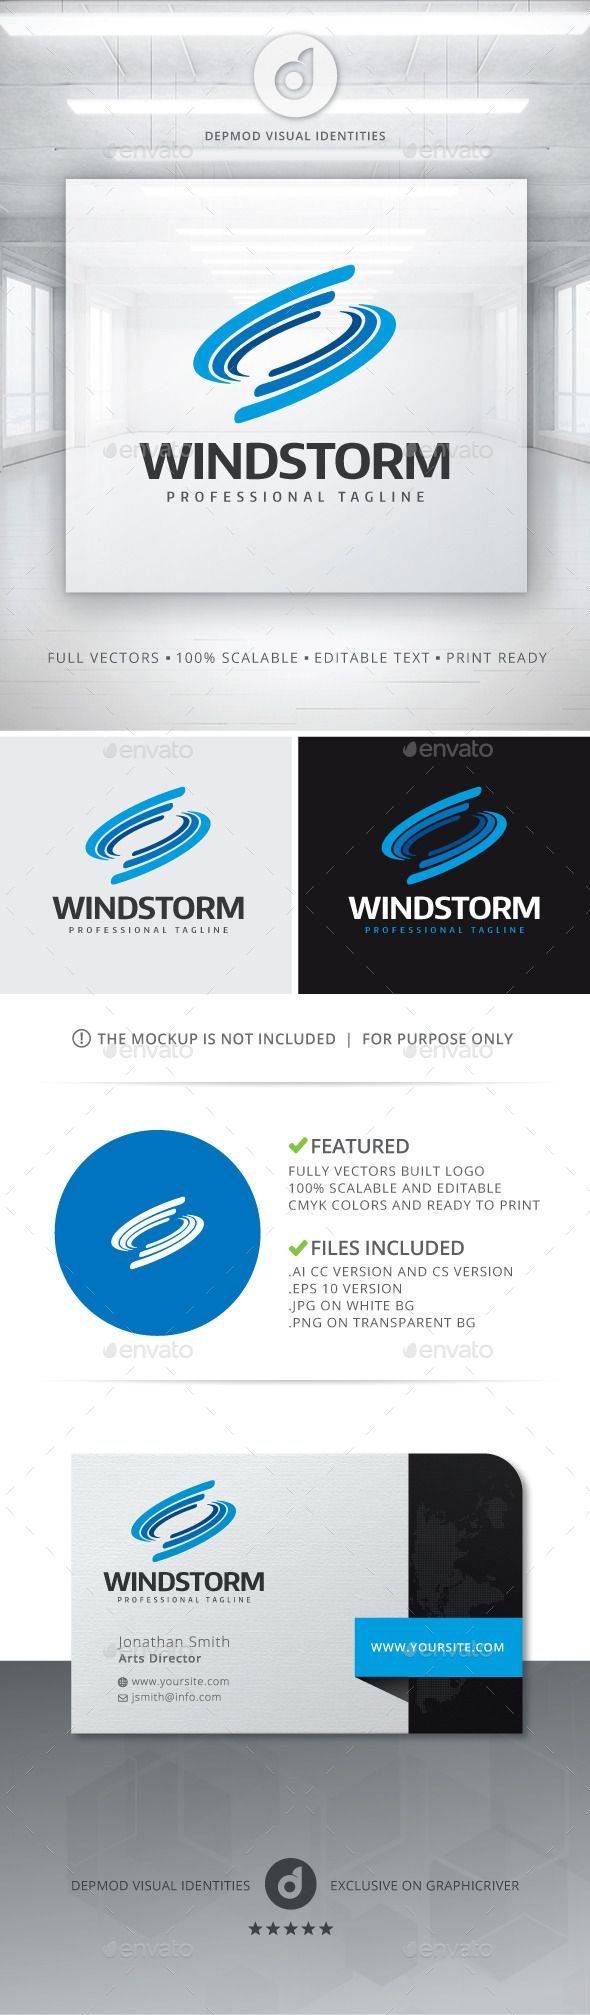 Wind Storm  Logo Design Template Vector #logotype Download it here: http://graphicriver.net/item/wind-storm-logo/11453632?s_rank=840?ref=nexion